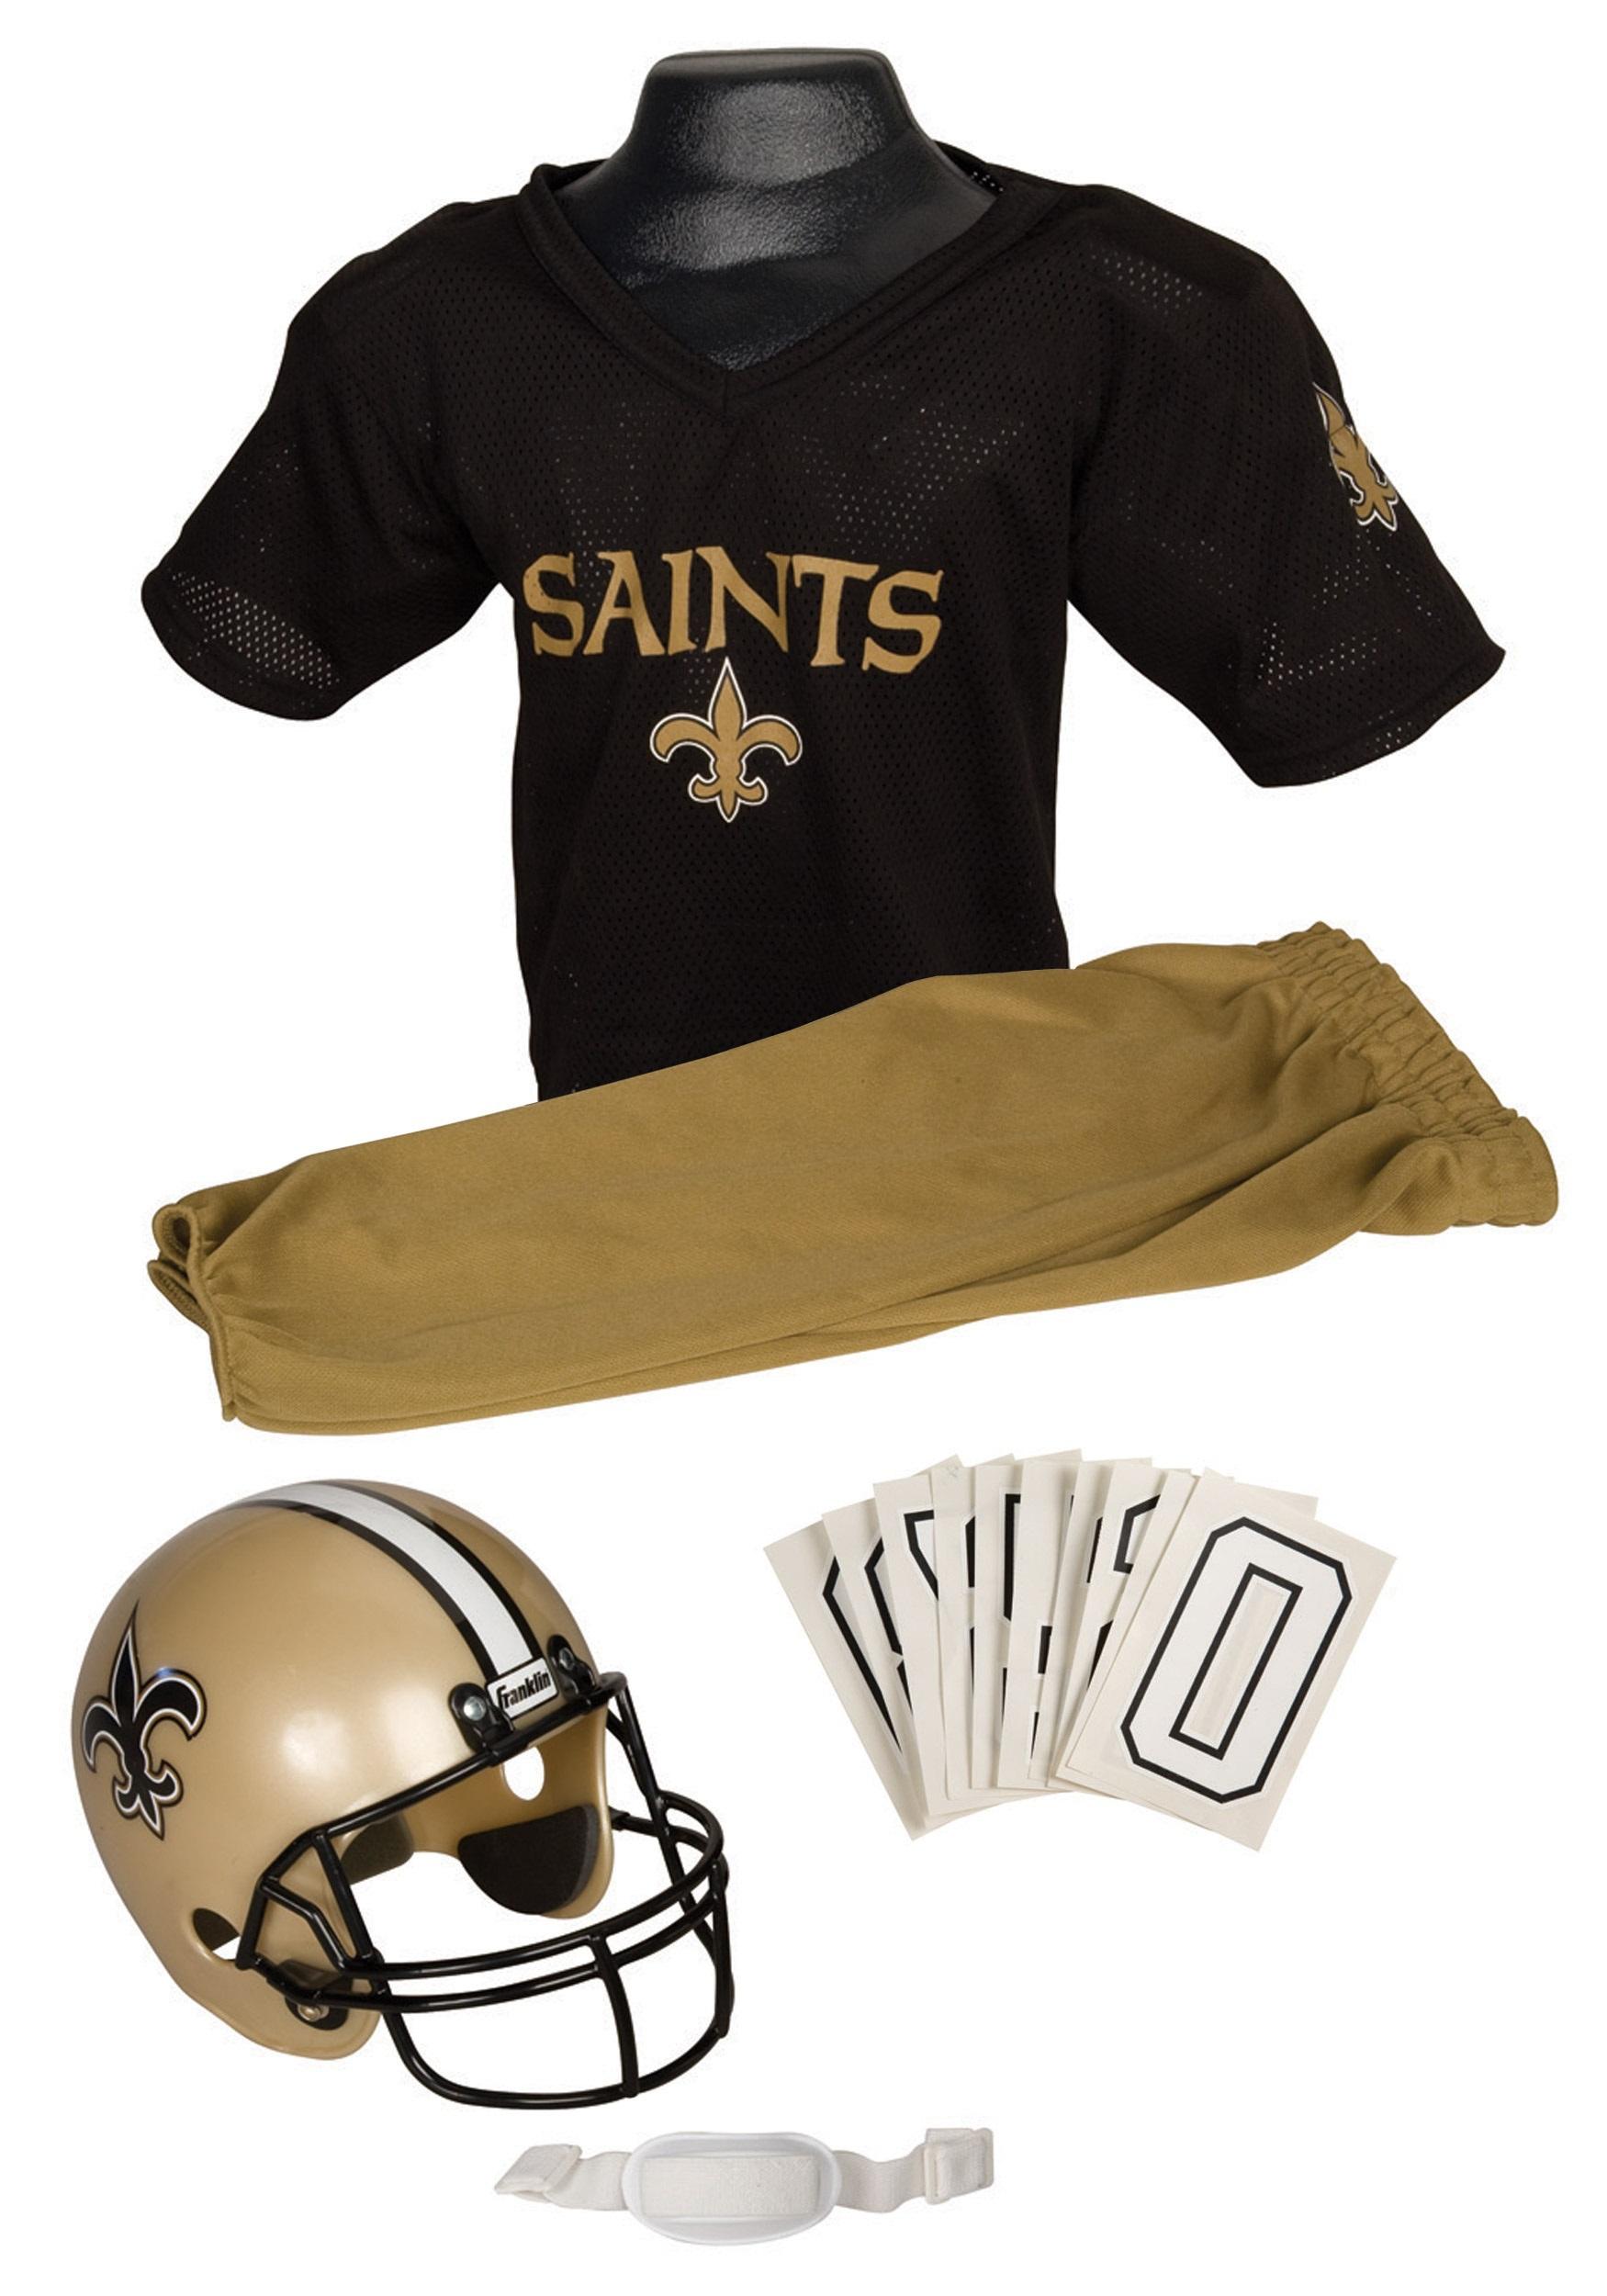 Kids Saints NFL Uniform Set